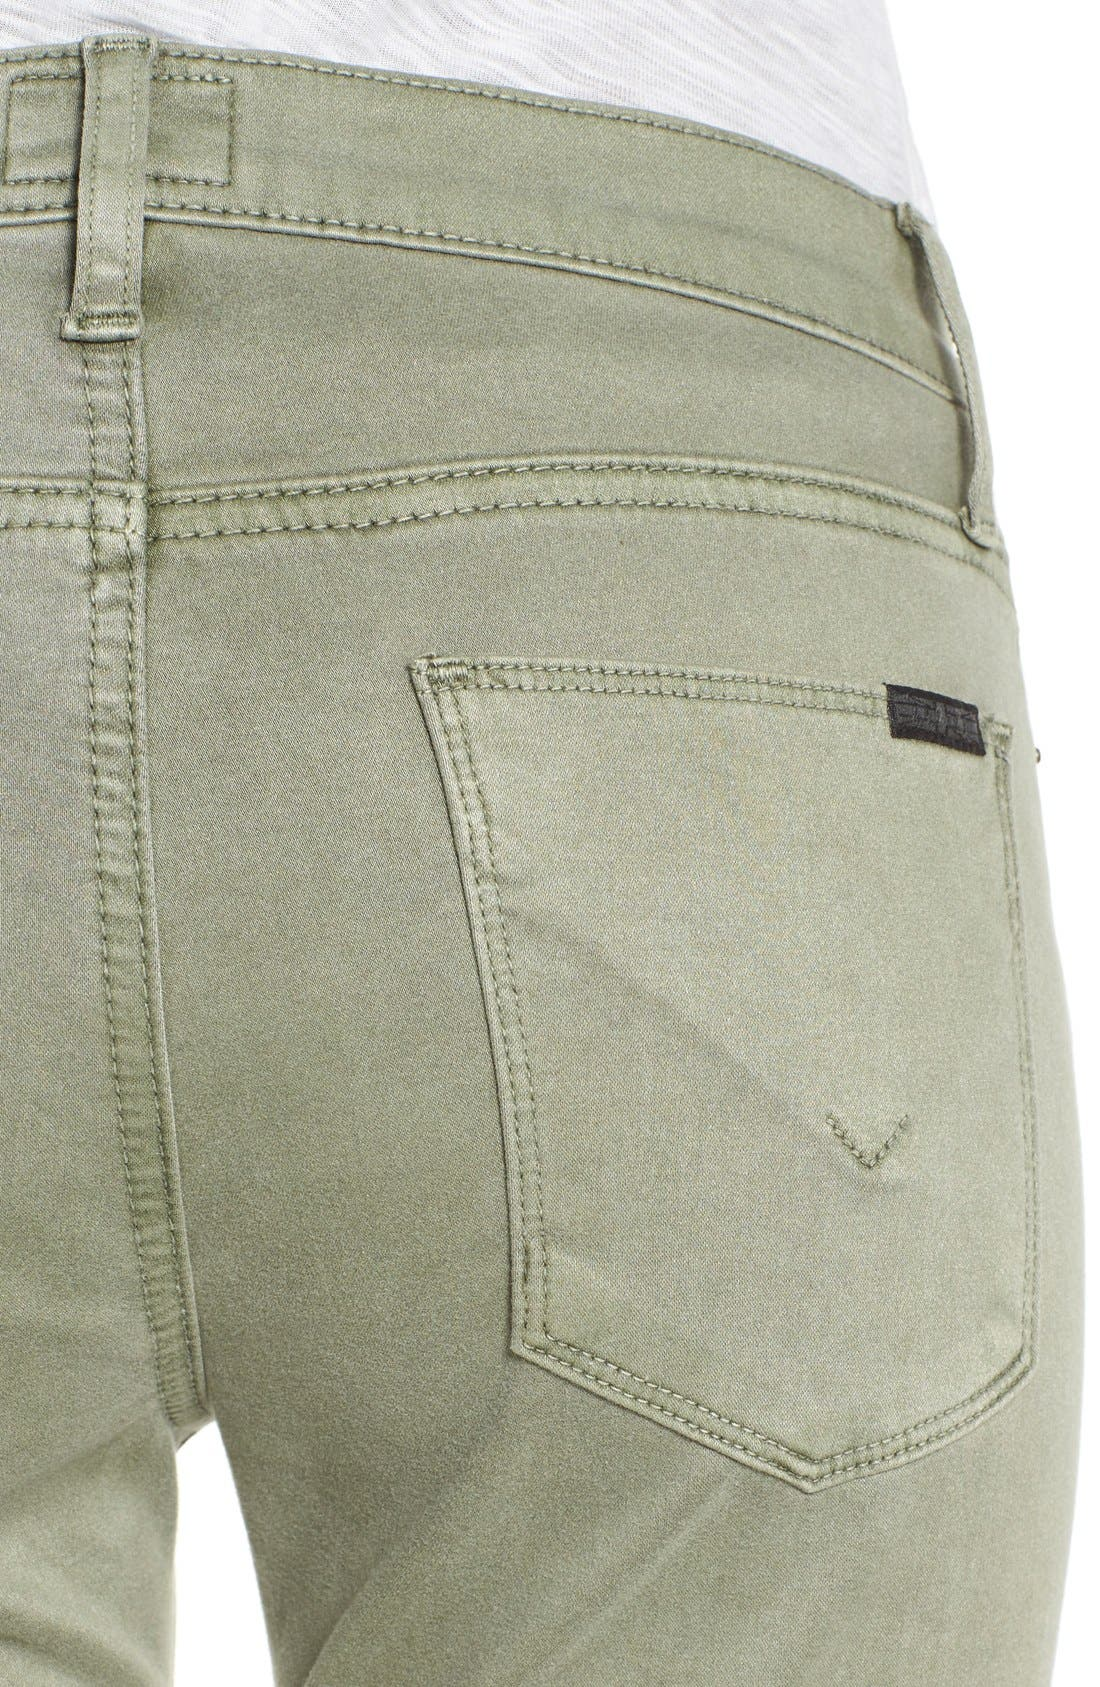 Alternate Image 4  - Hudson Jeans 'Nico' Ankle Super Skinny Jeans (Earth Works)